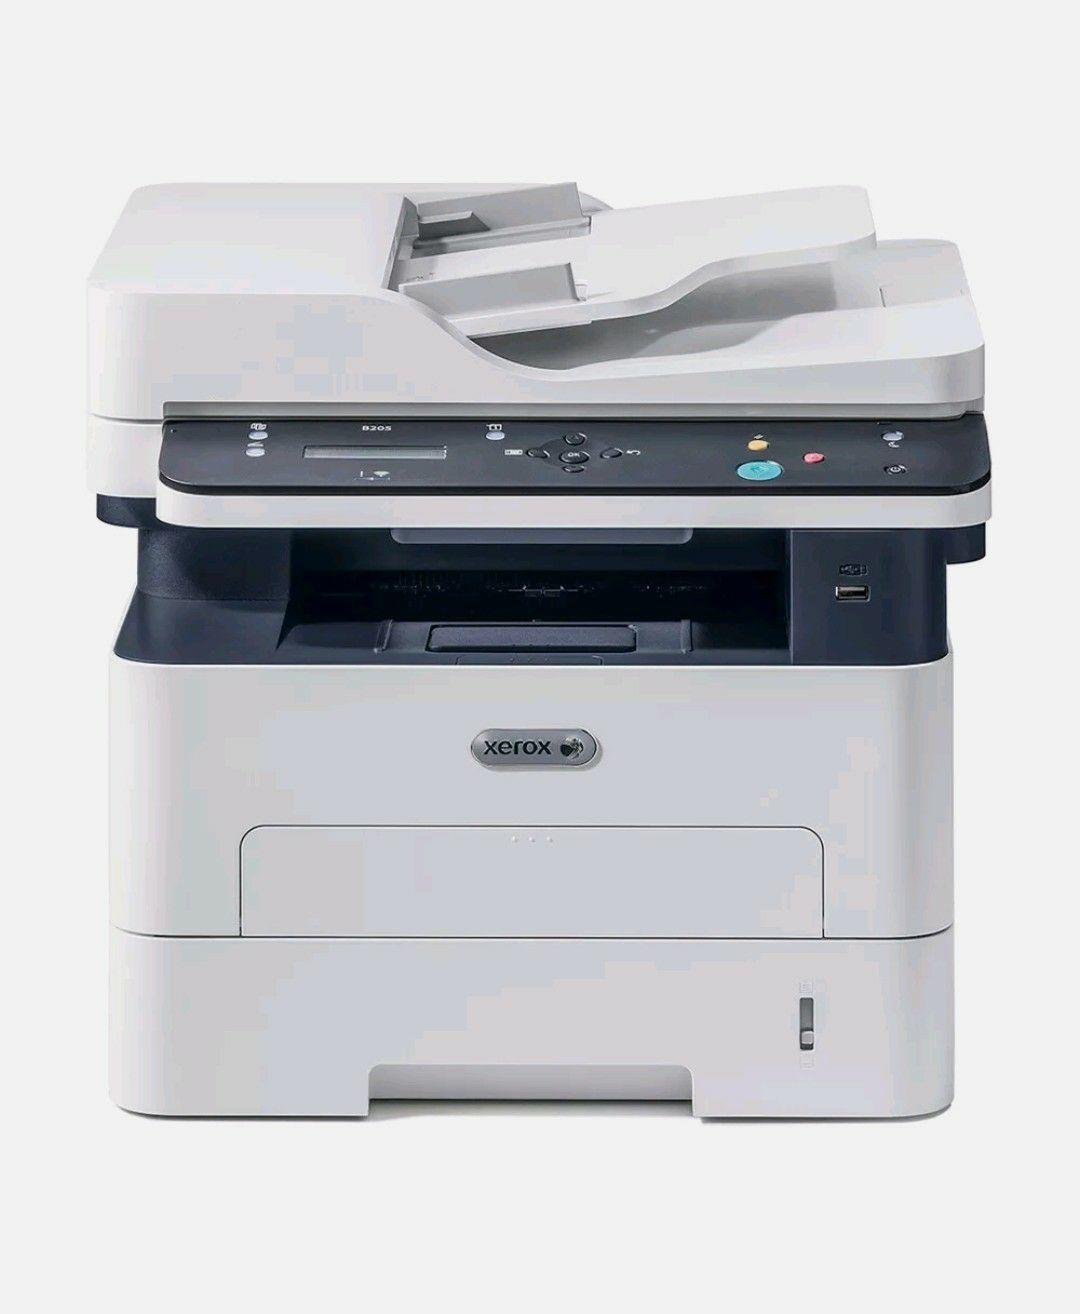 Multifunctional Xerox Wireless Laser Home Printer, Scanner & Copier - £104.96 delivered using code @ printerlanduk / eBay